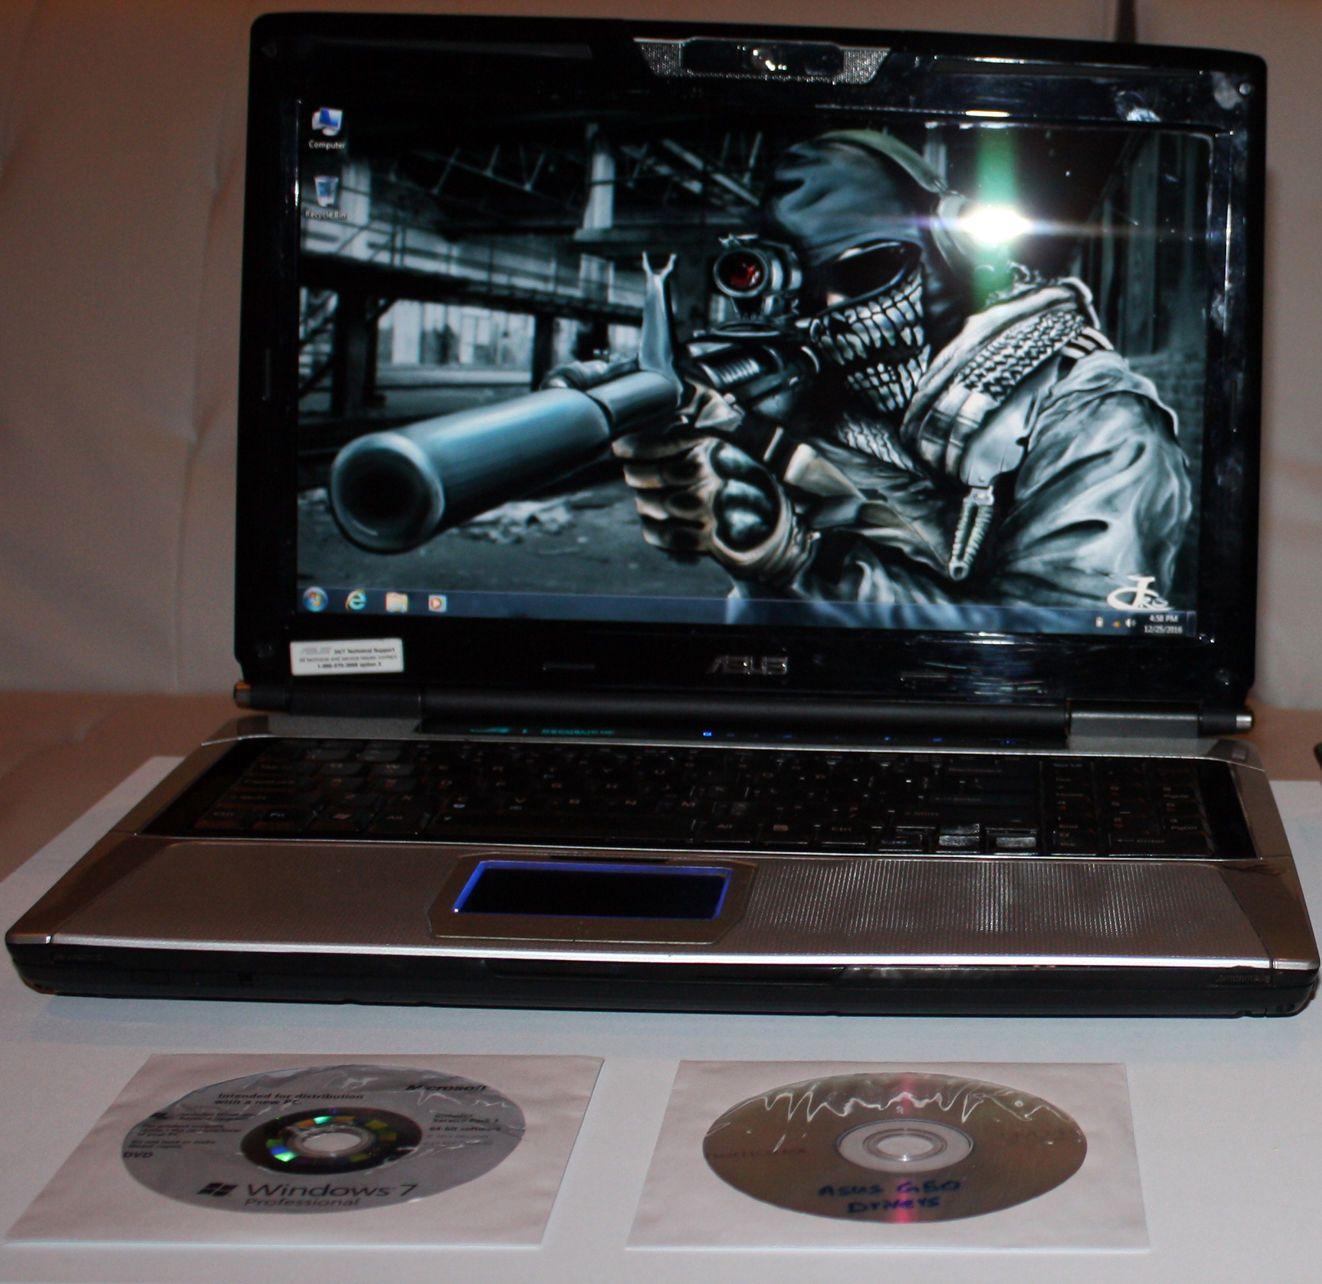 Asus G50 Gaming Laptop 2 26ghz 1 Terabyte Hdd 4gb Ram N Geforce 9800m Win 7 Computer Security Best Laptops Terabyte